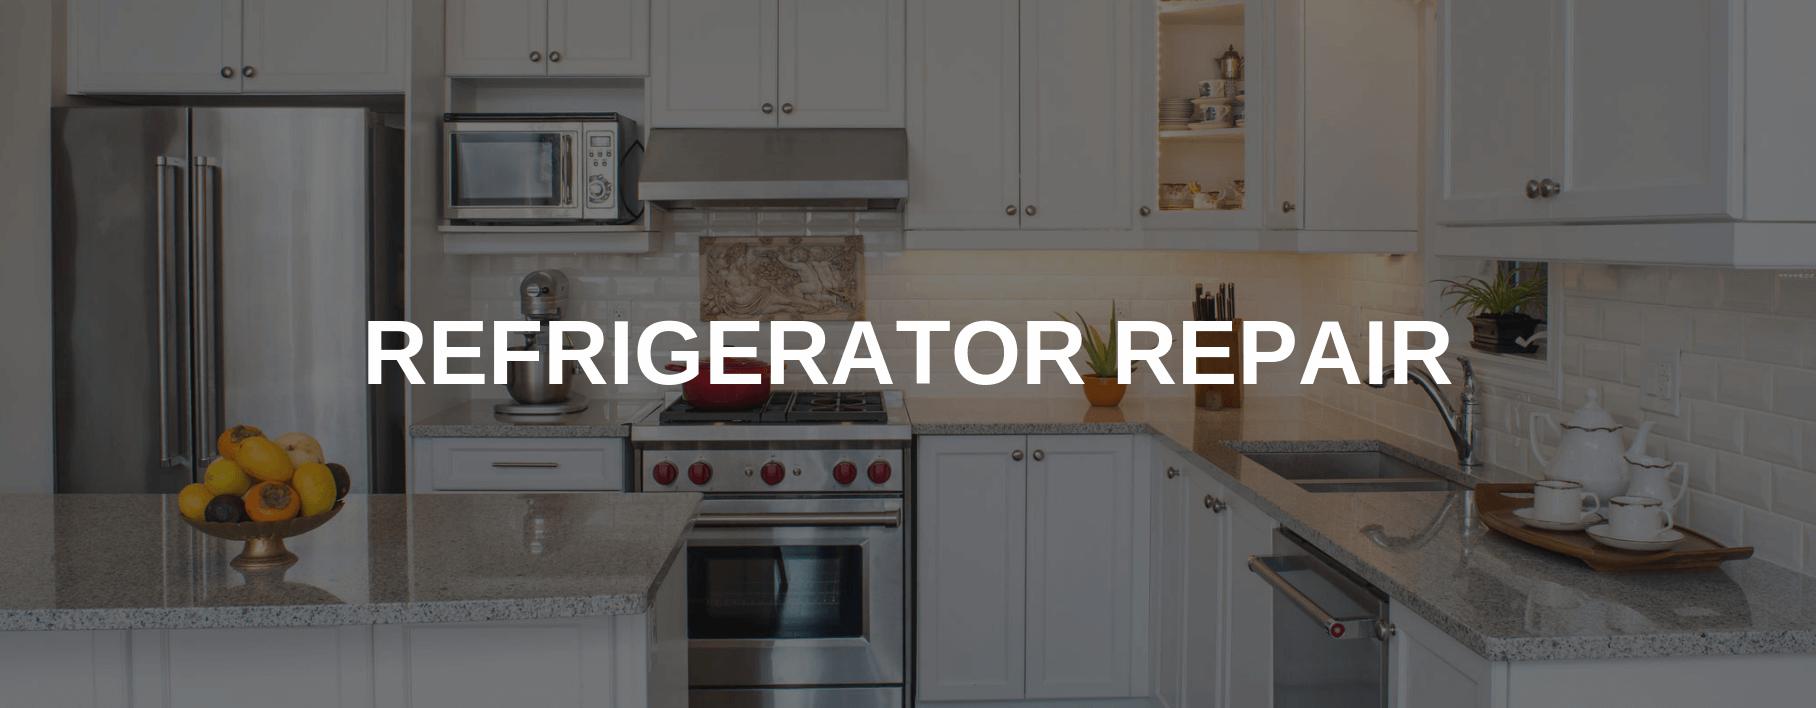 fontana refrigerator repair